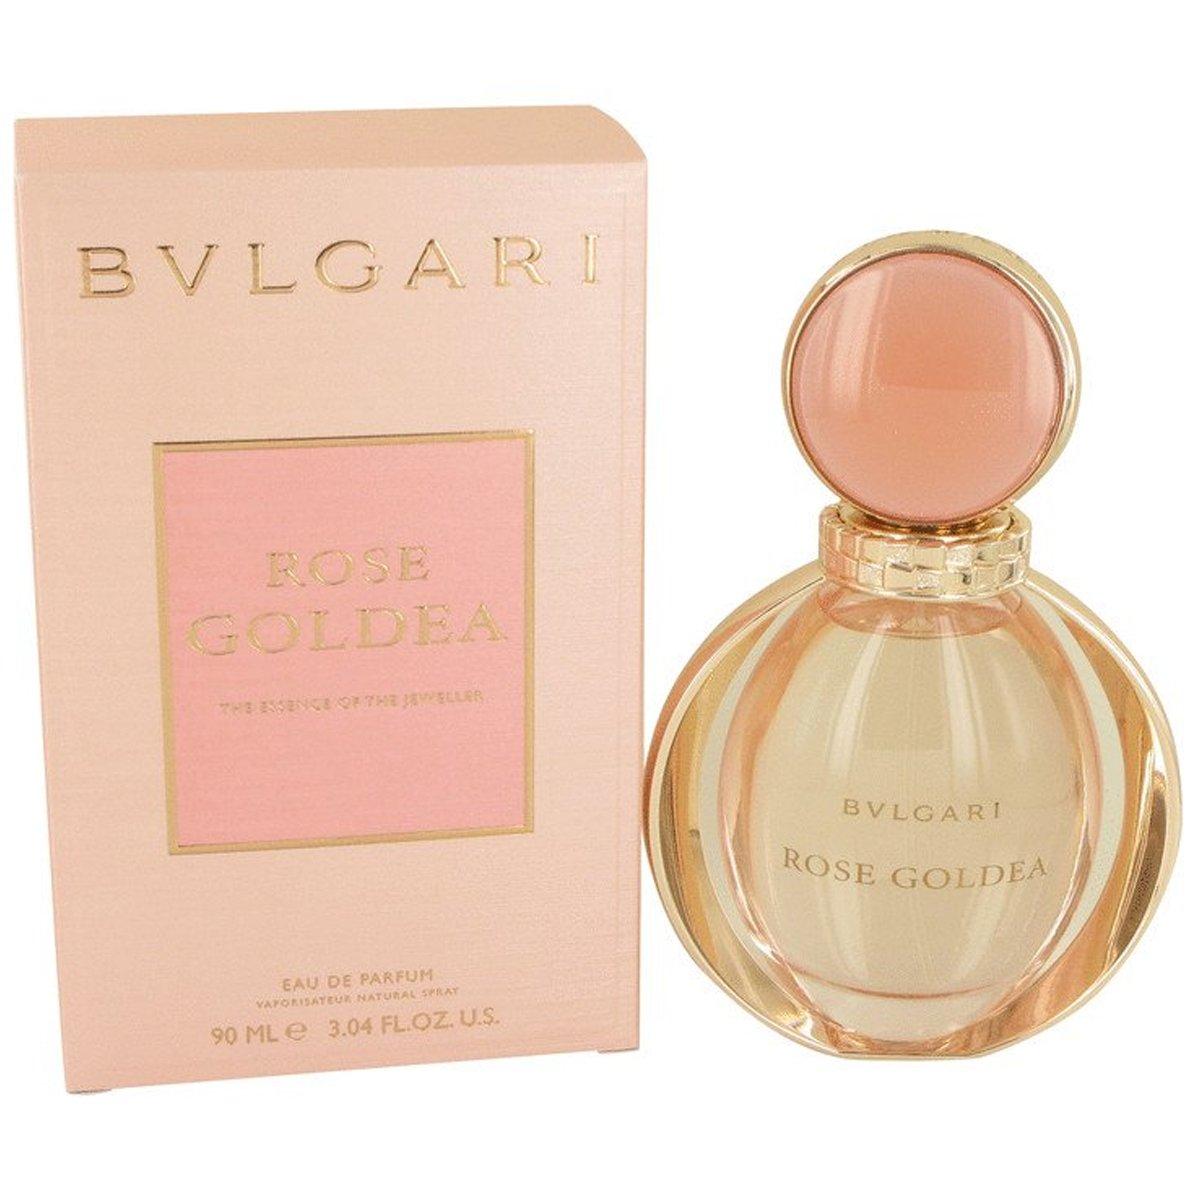 0c418e1a69f5 Amazon.com   Bvlgari Rose Goldea Eau de Parfum Spray for Woman, EDP 3 fl  oz. 90 ml   Beauty